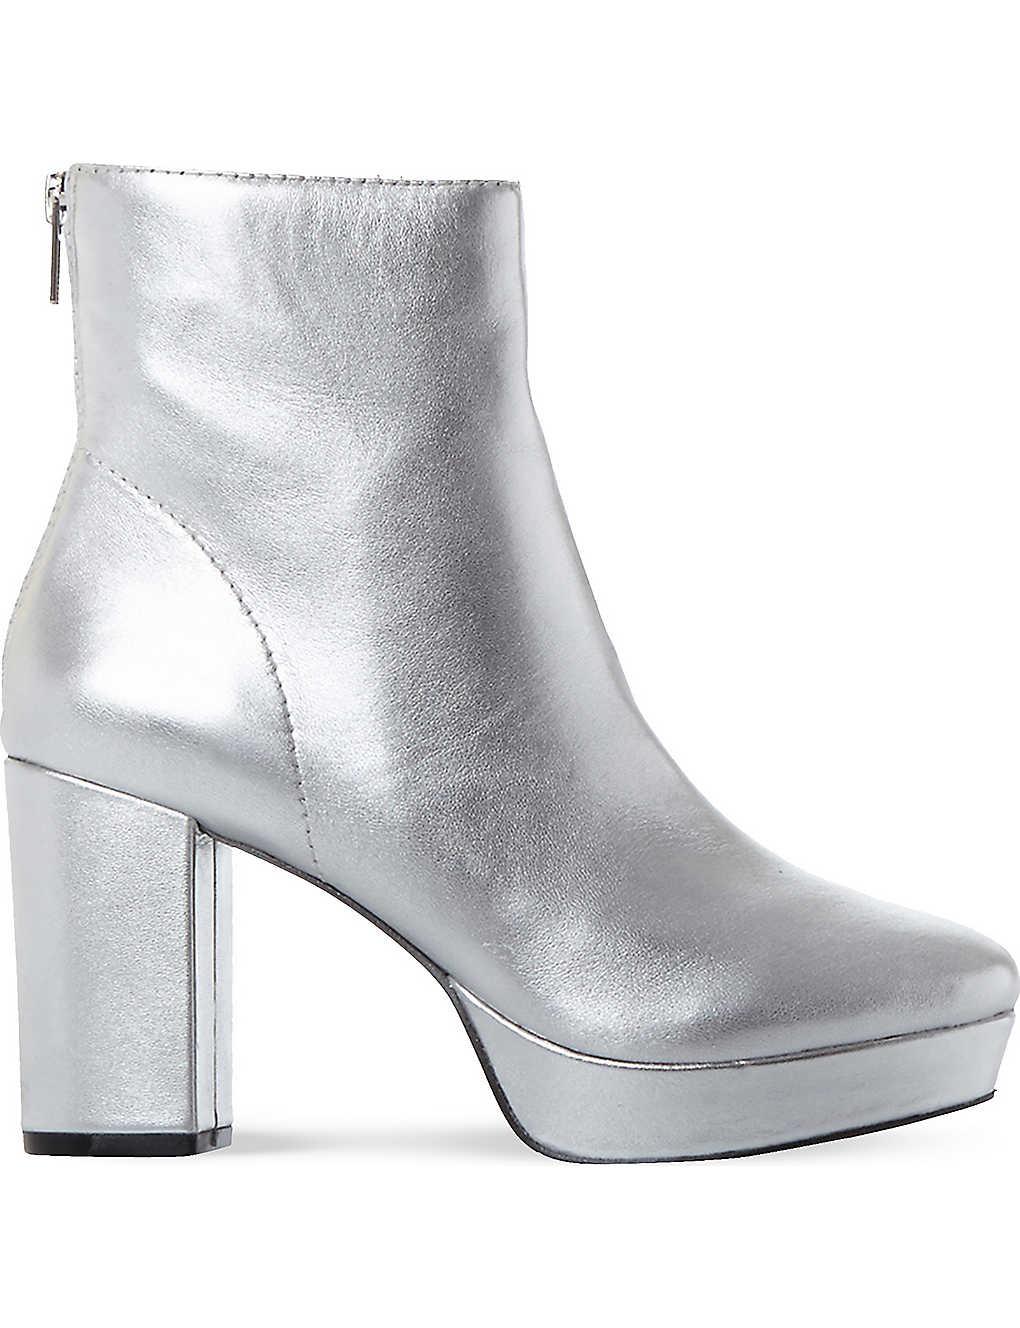 16da147c95b STEVE MADDEN - Peace SM leather ankle boot